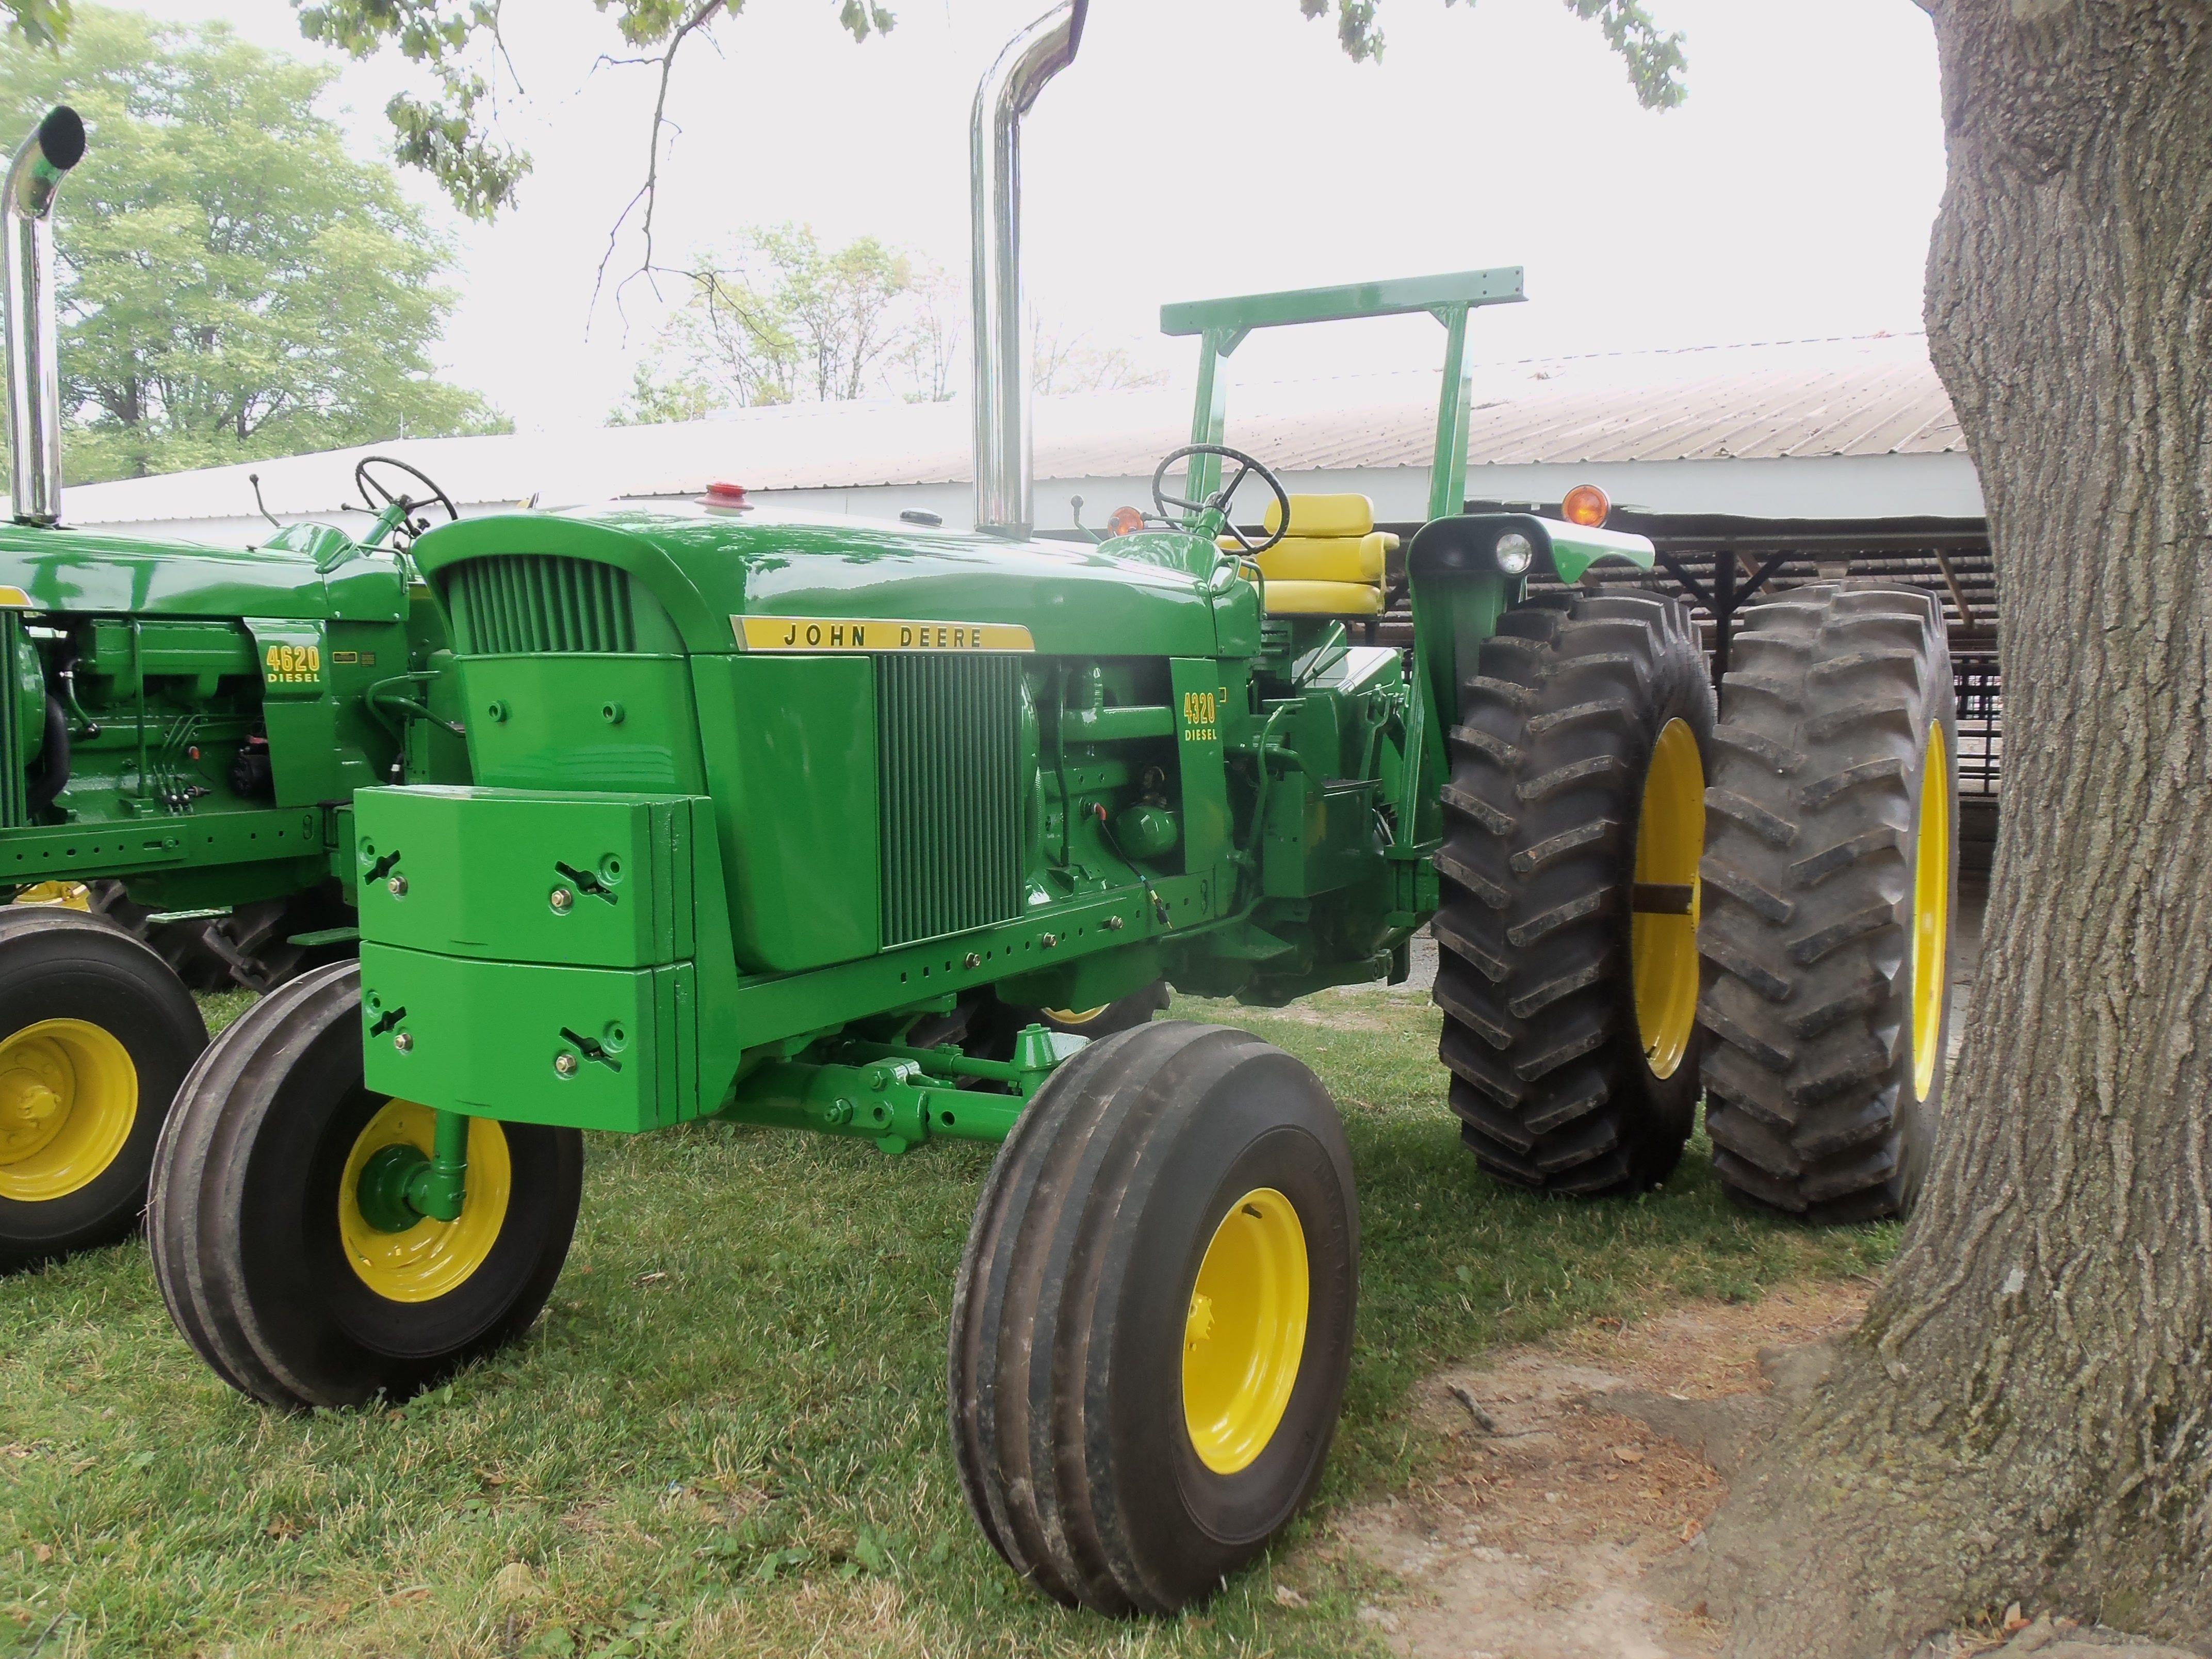 116hp John Deere 4320.Serial Number T613R 027387R Big Tractors, John Deere  Tractors,